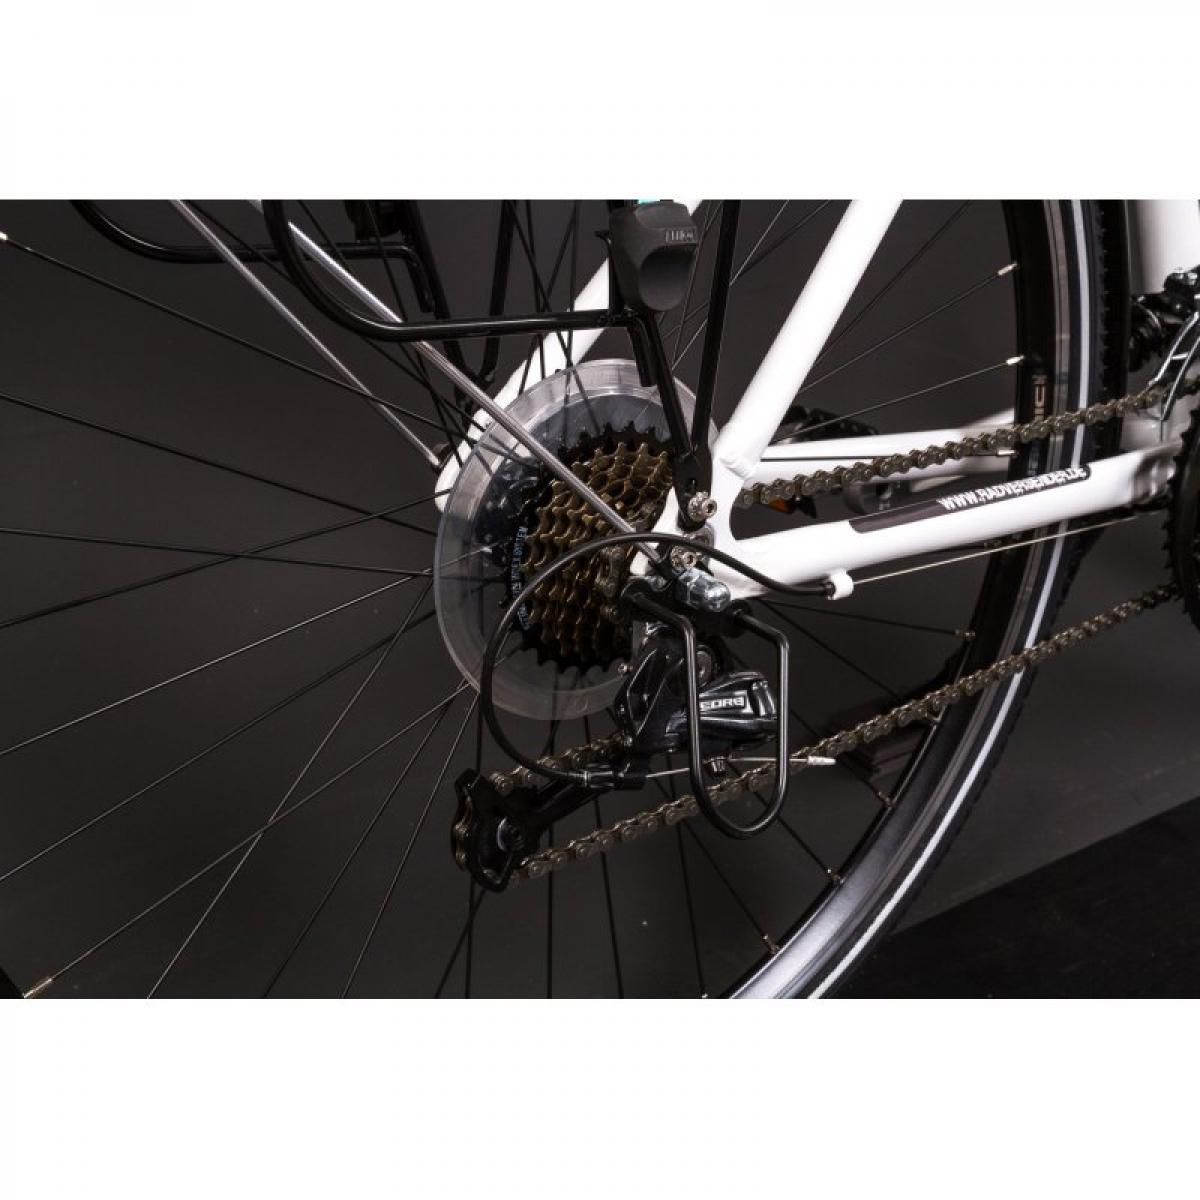 28 zoll alu fahrrad trekking damen rad shimano deore 24. Black Bedroom Furniture Sets. Home Design Ideas